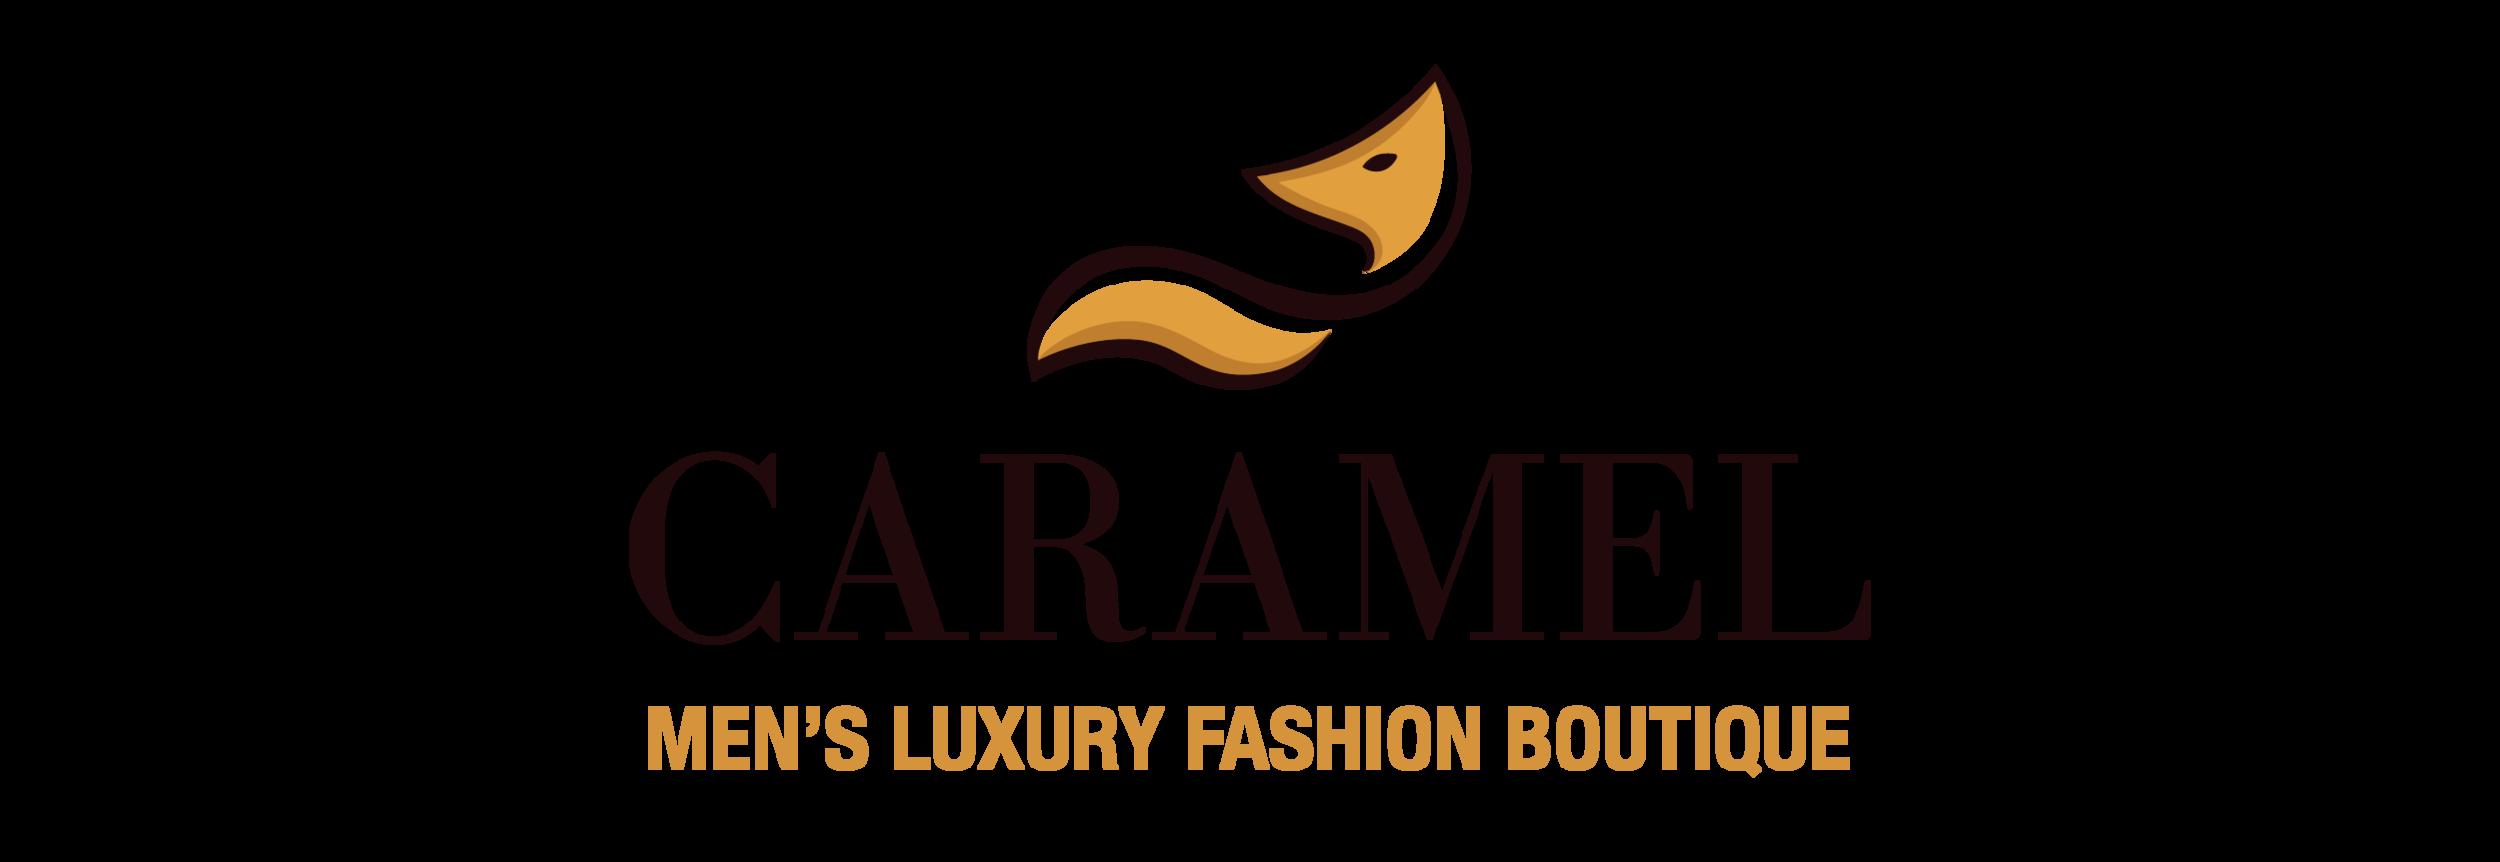 Caramel-Logo.png